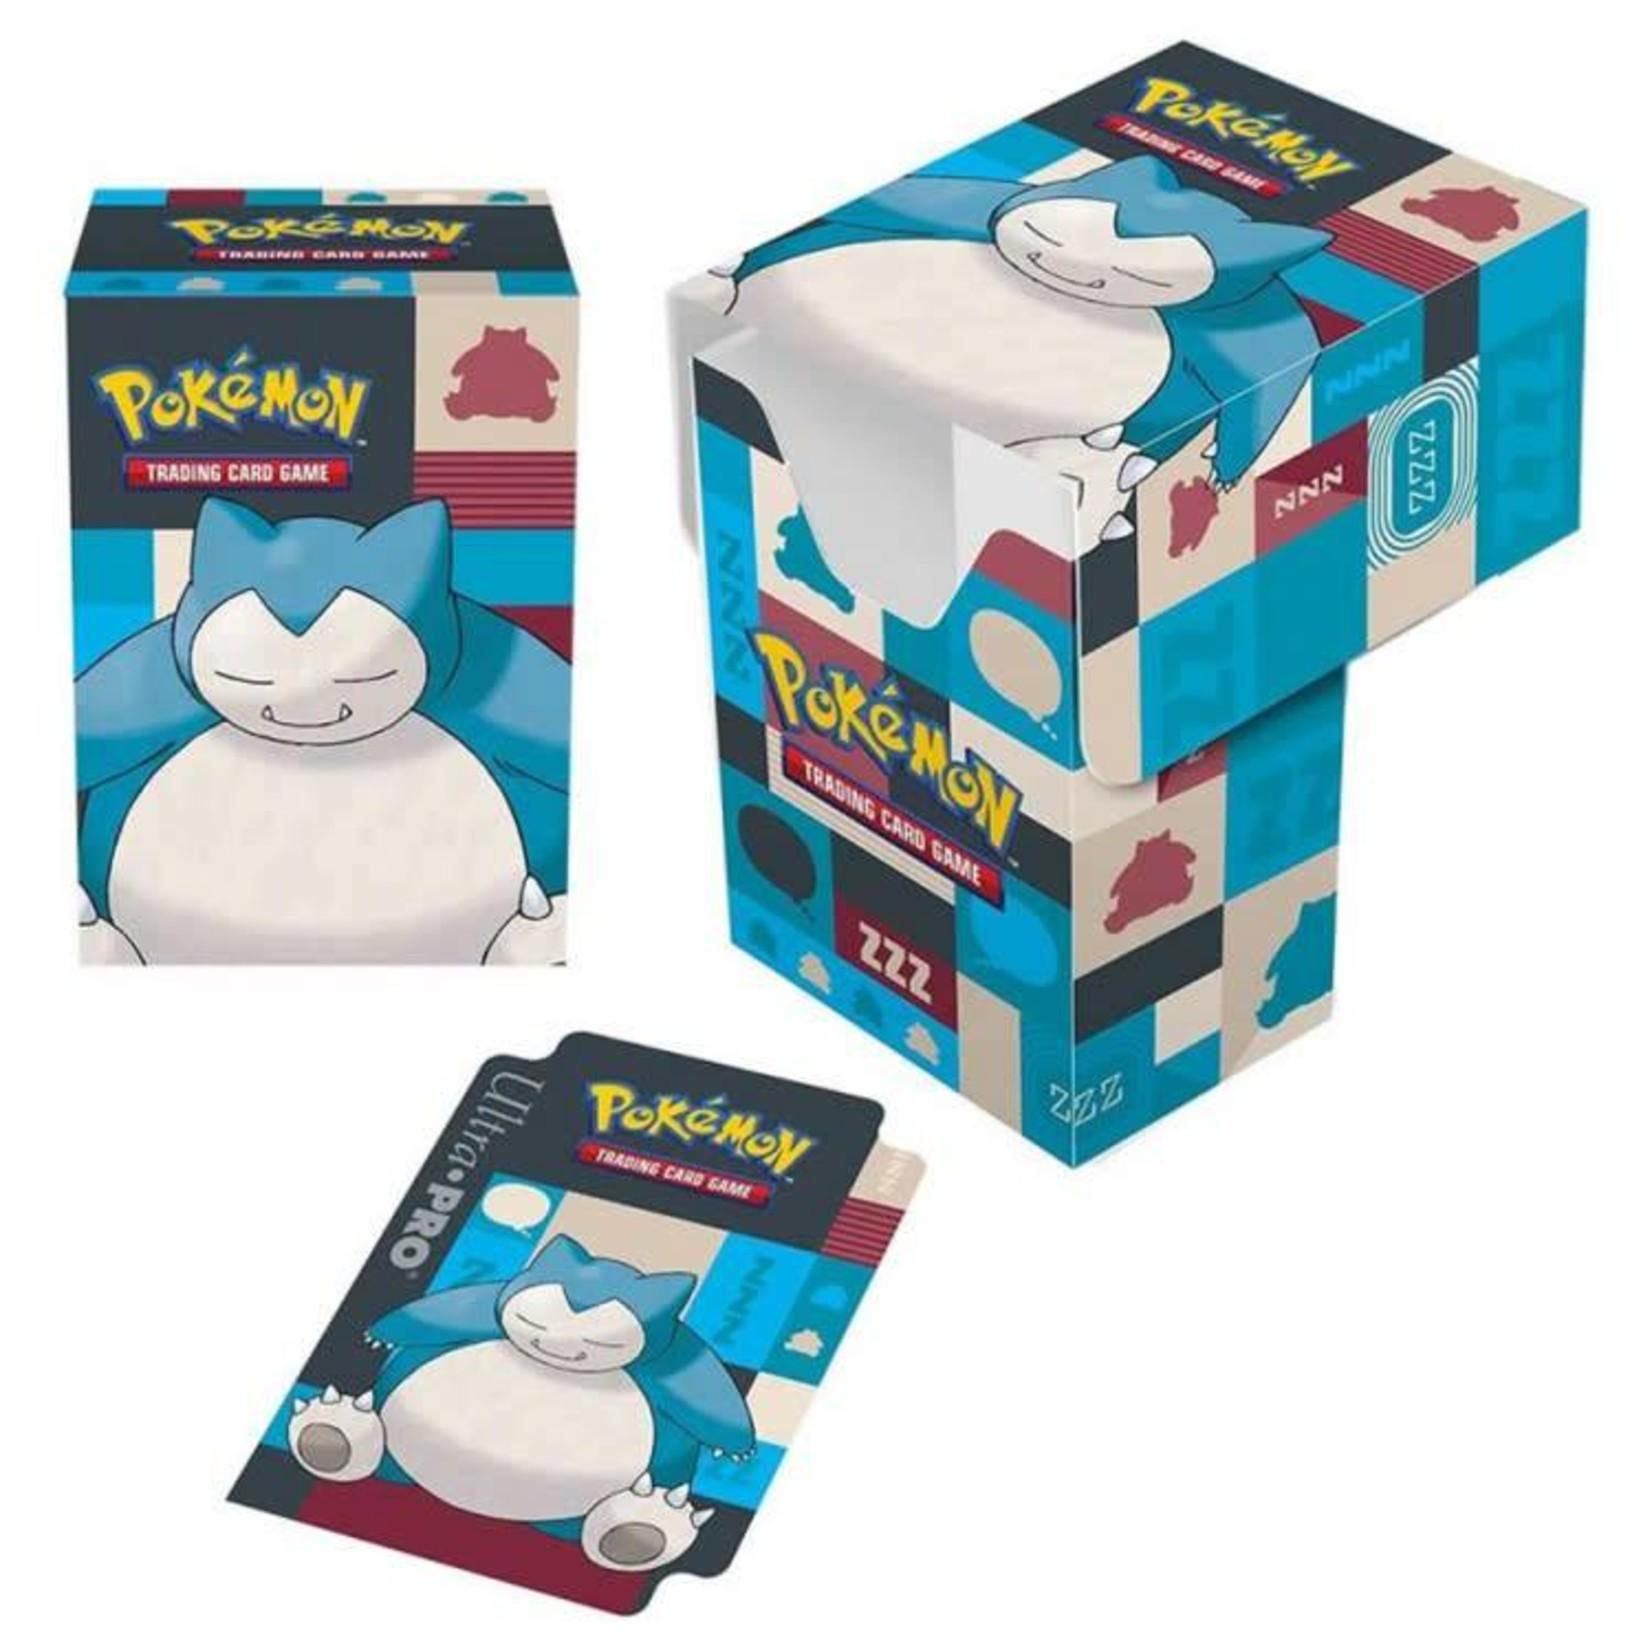 Ultra Pro Pokemon: Snorlax Full View Deck Box